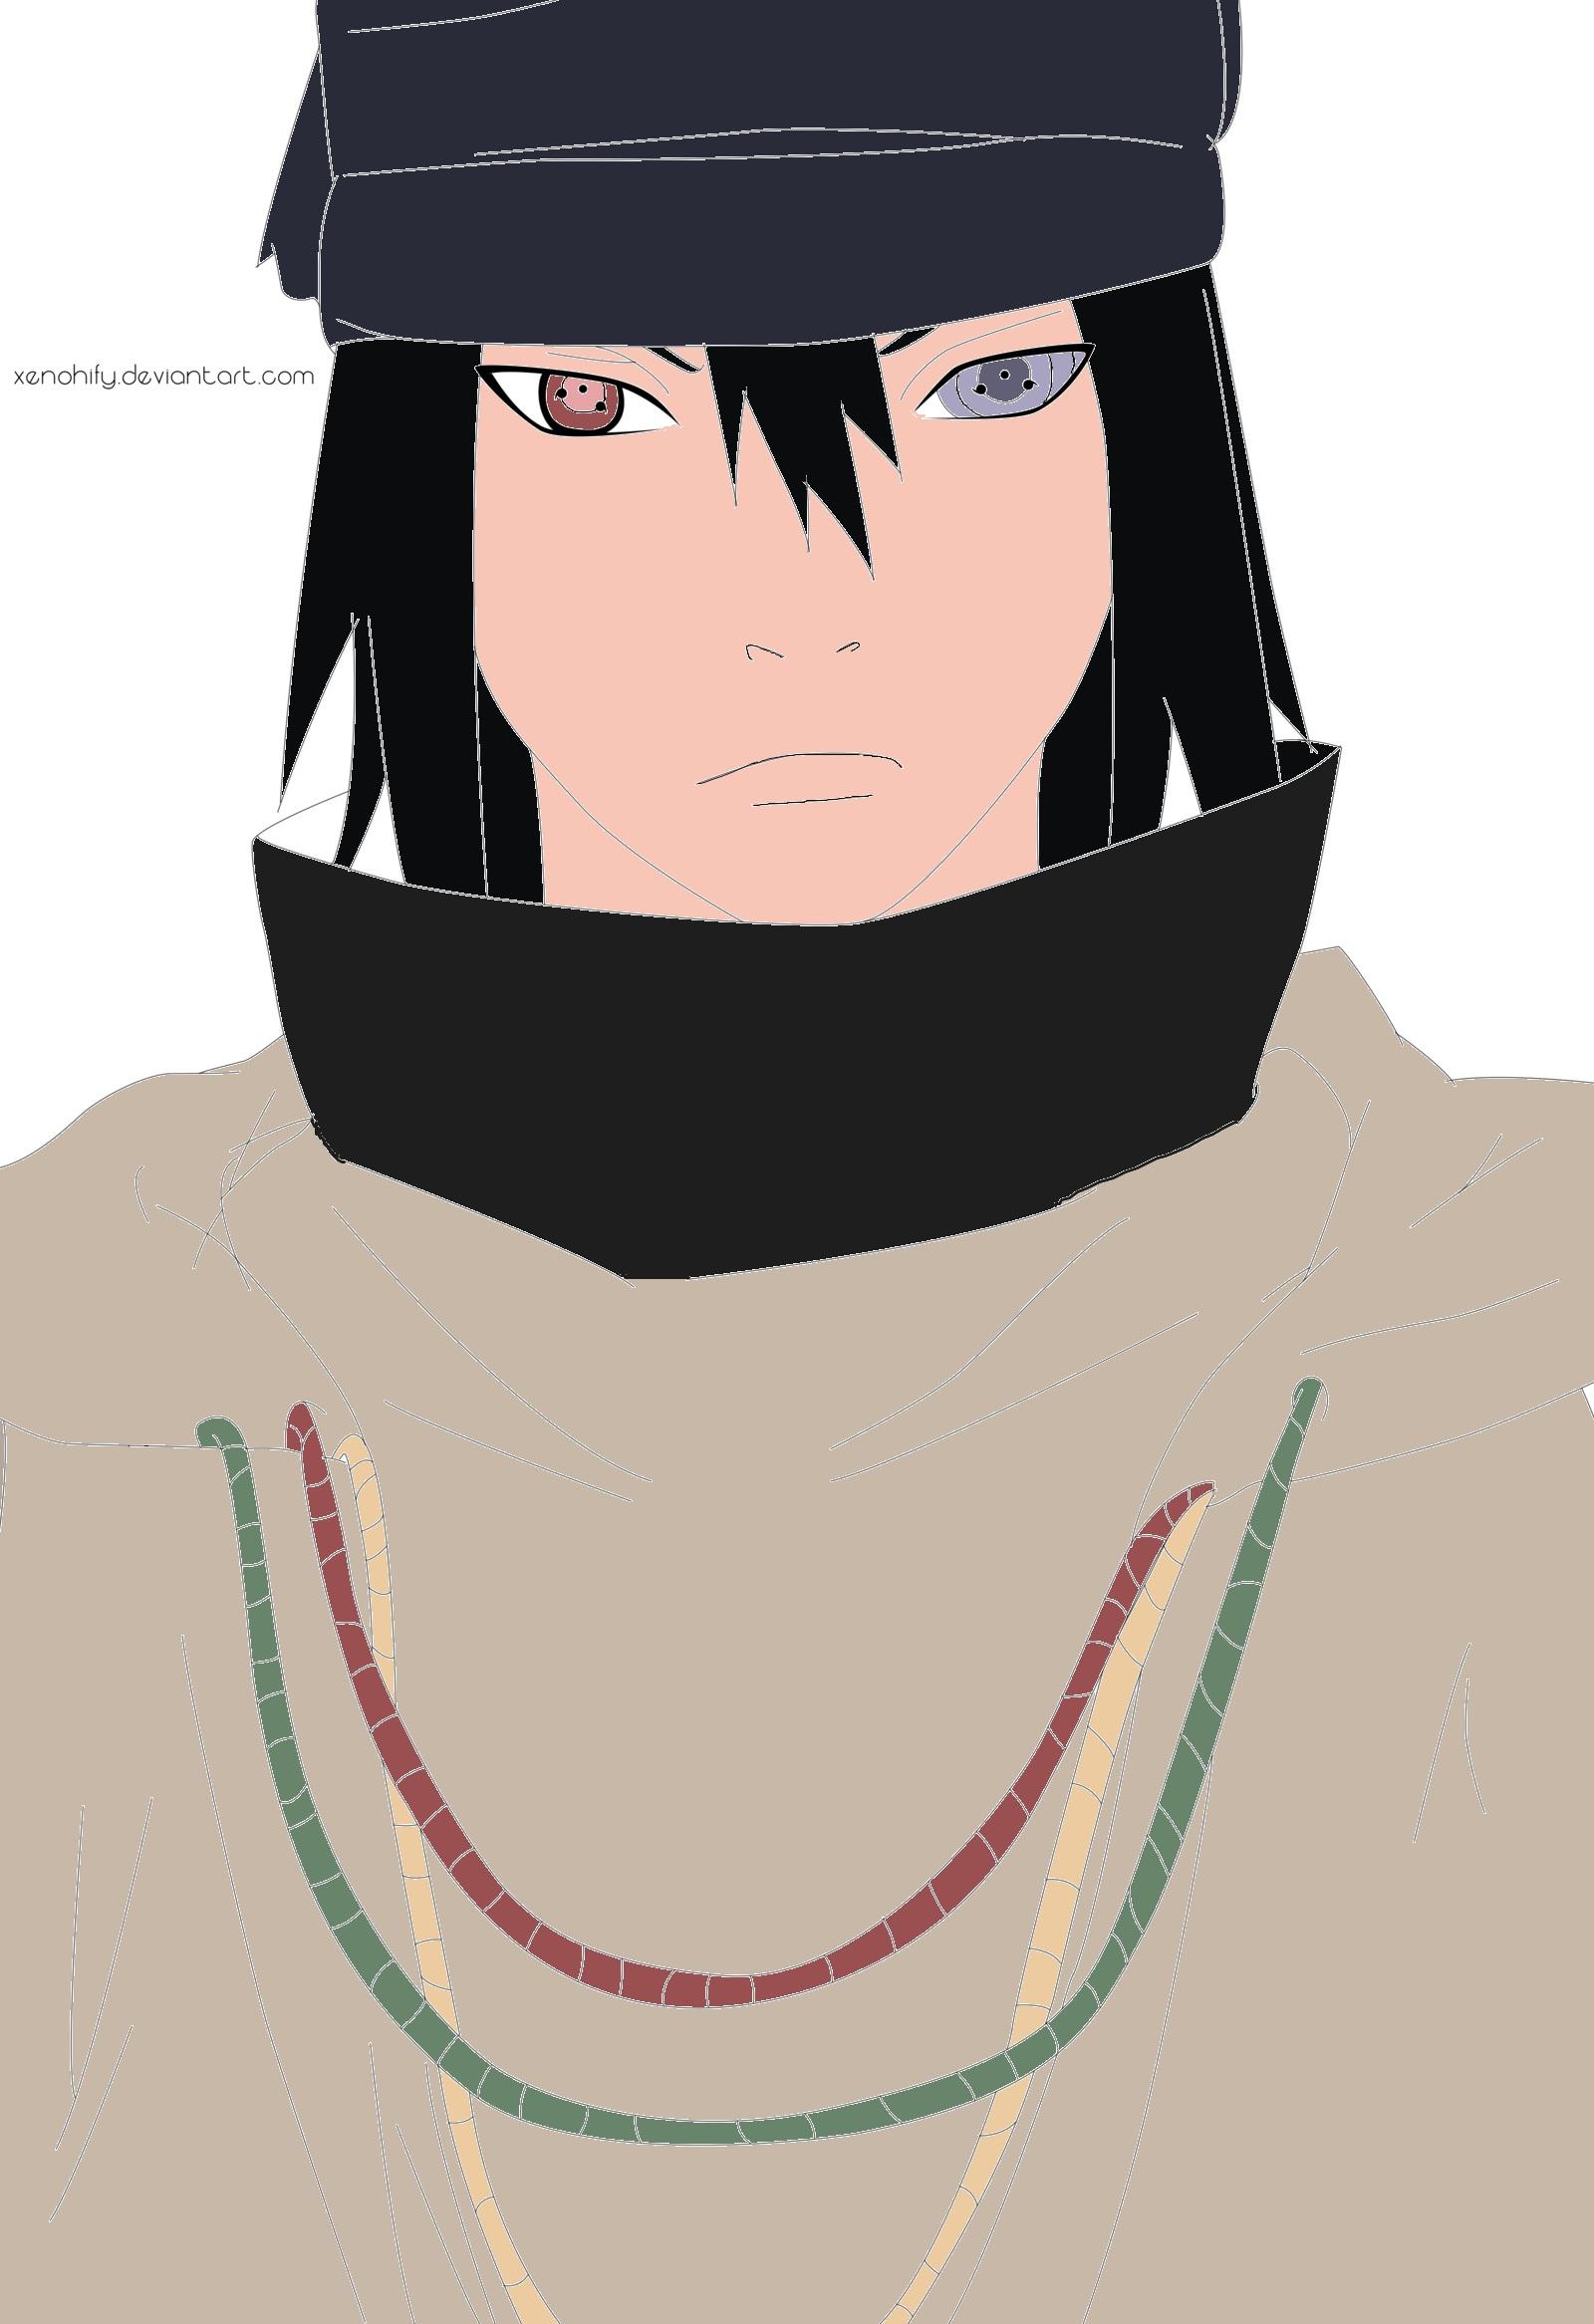 image sasuke uchiha naruto the last movie jpg really me wiki